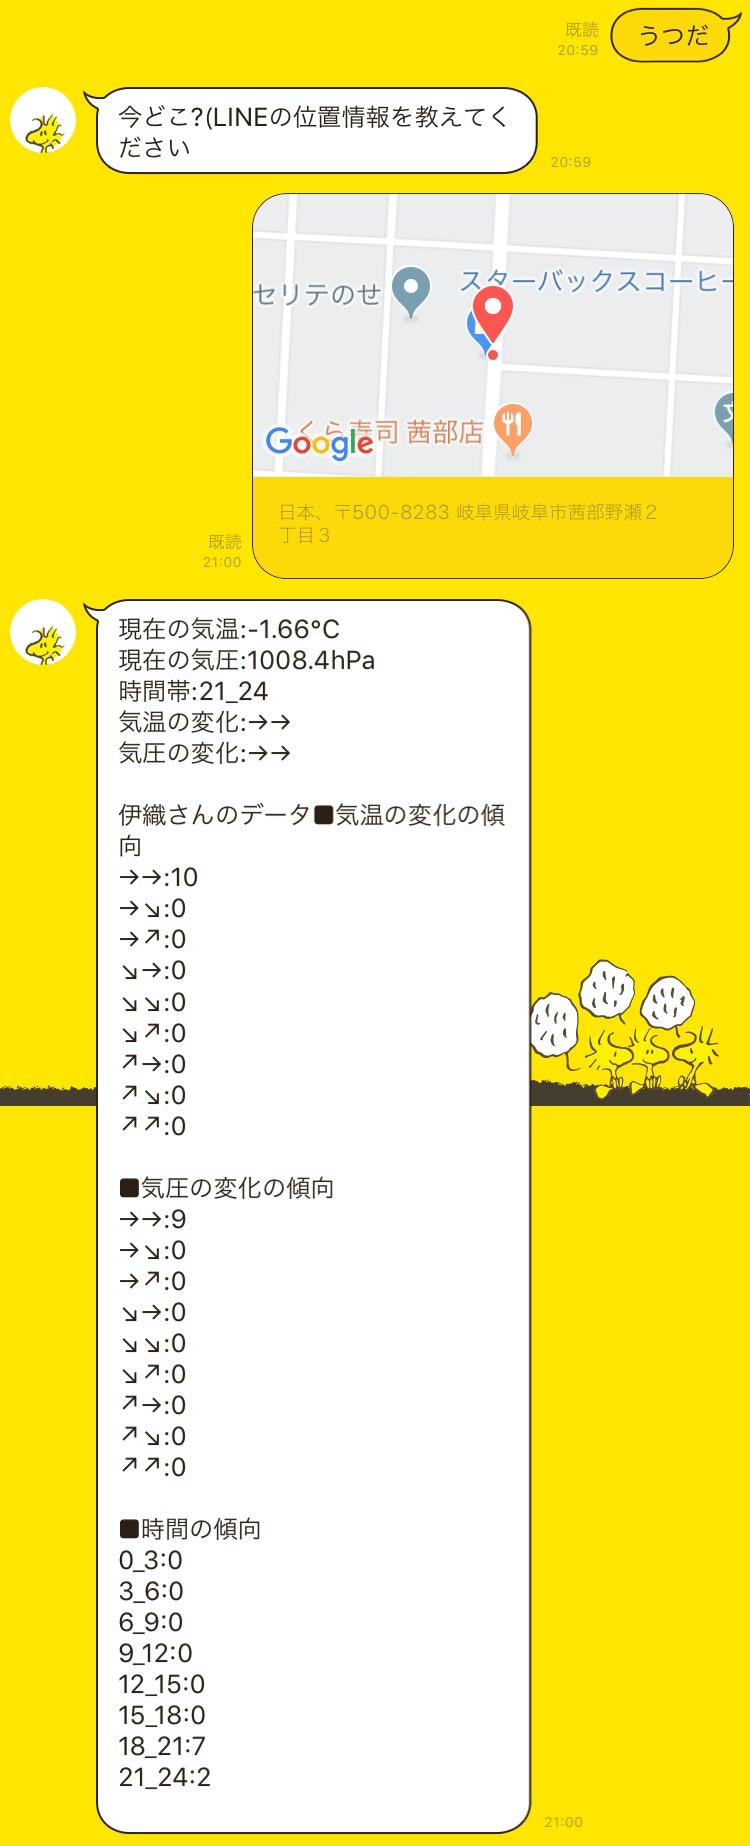 LINE_capture_570196841.455071.JPG